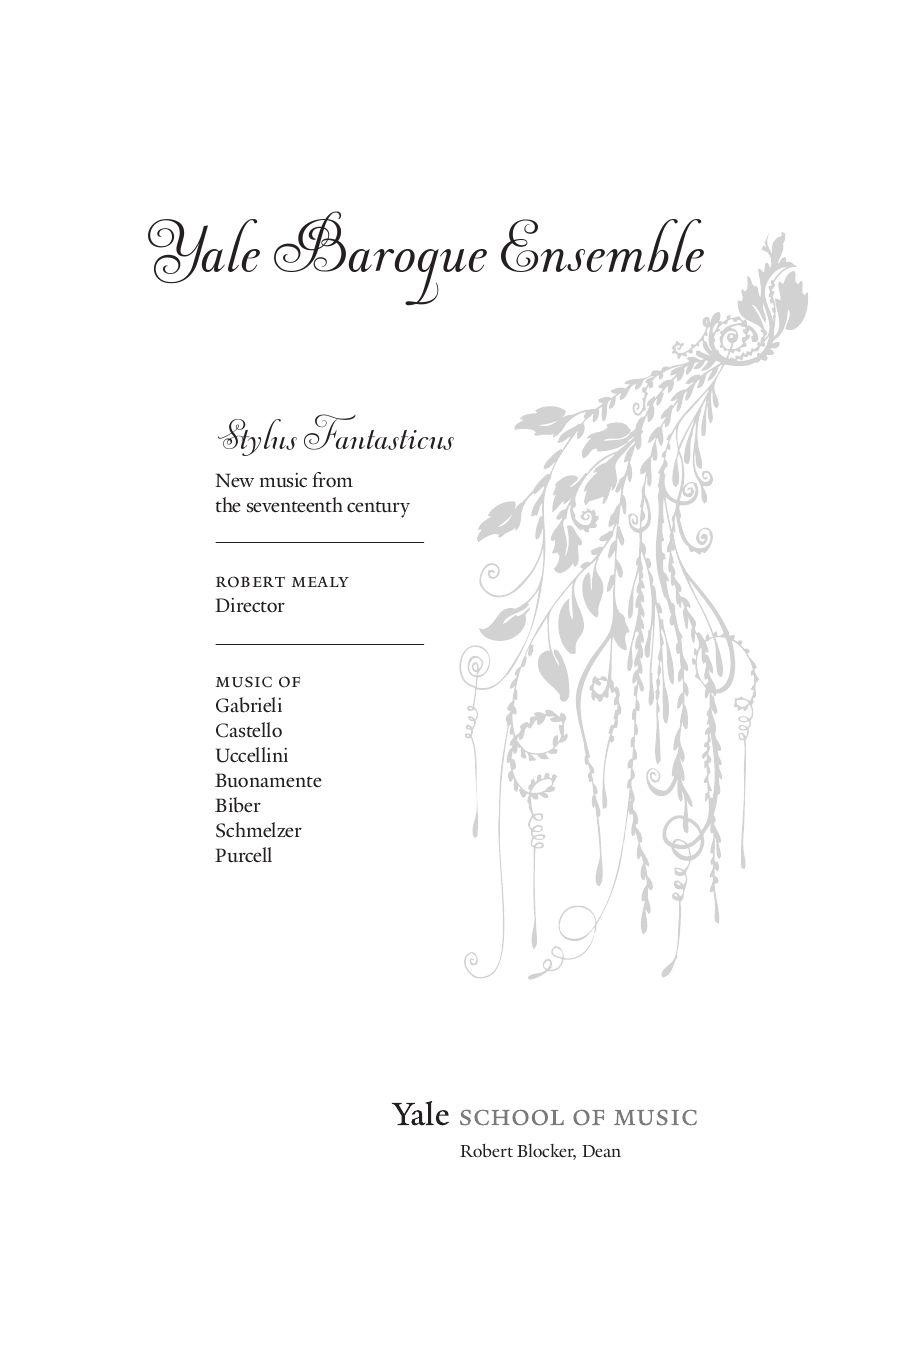 Yale Baroque Ensemble by Yale School of Music - issuu